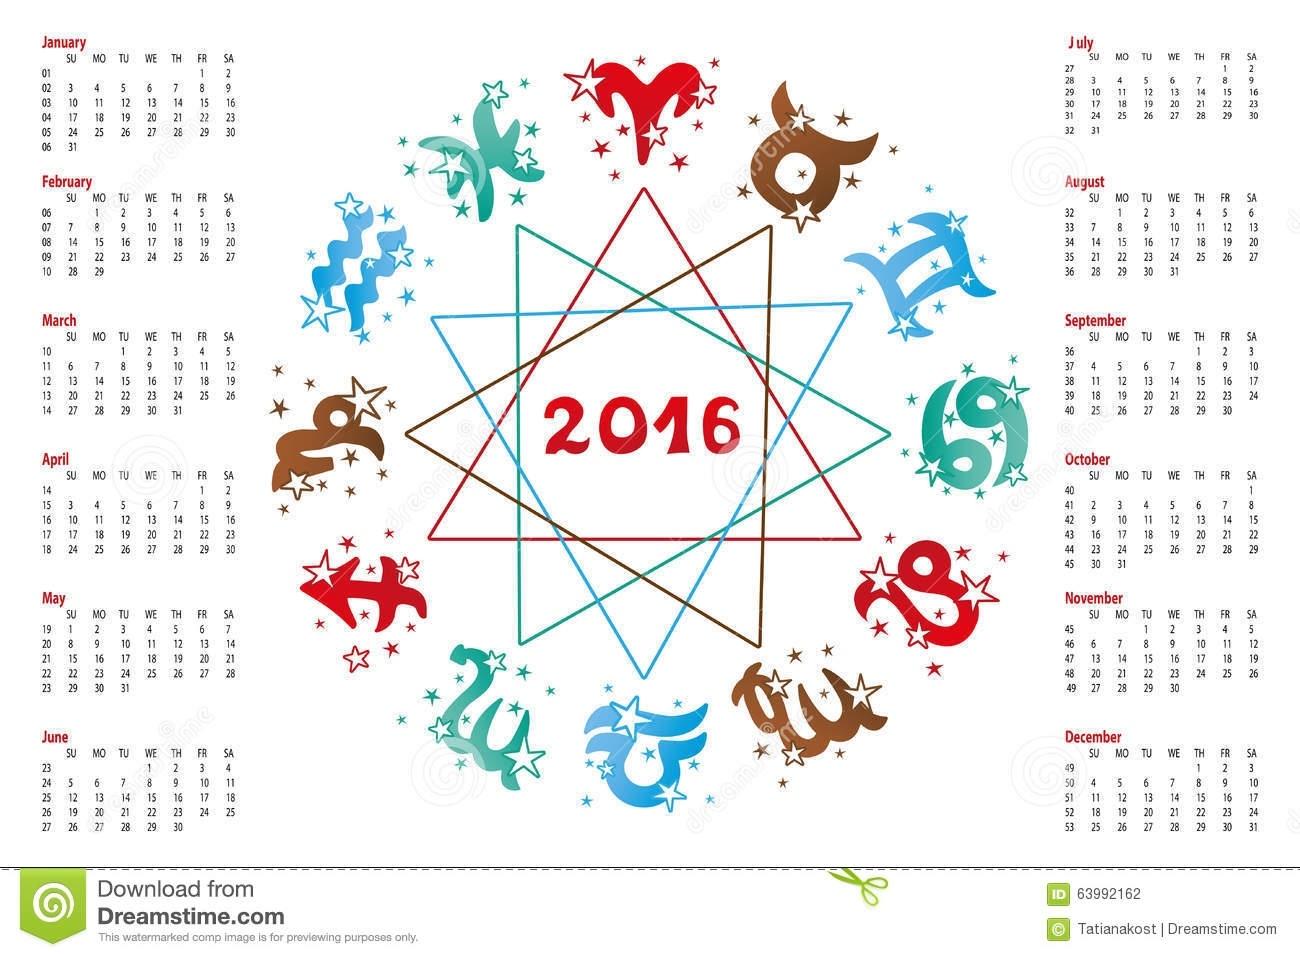 Calendar 2016.horoscope Zodiac Sign Stock Vector - Illustration Of Zodiac Calendar Signs Dates